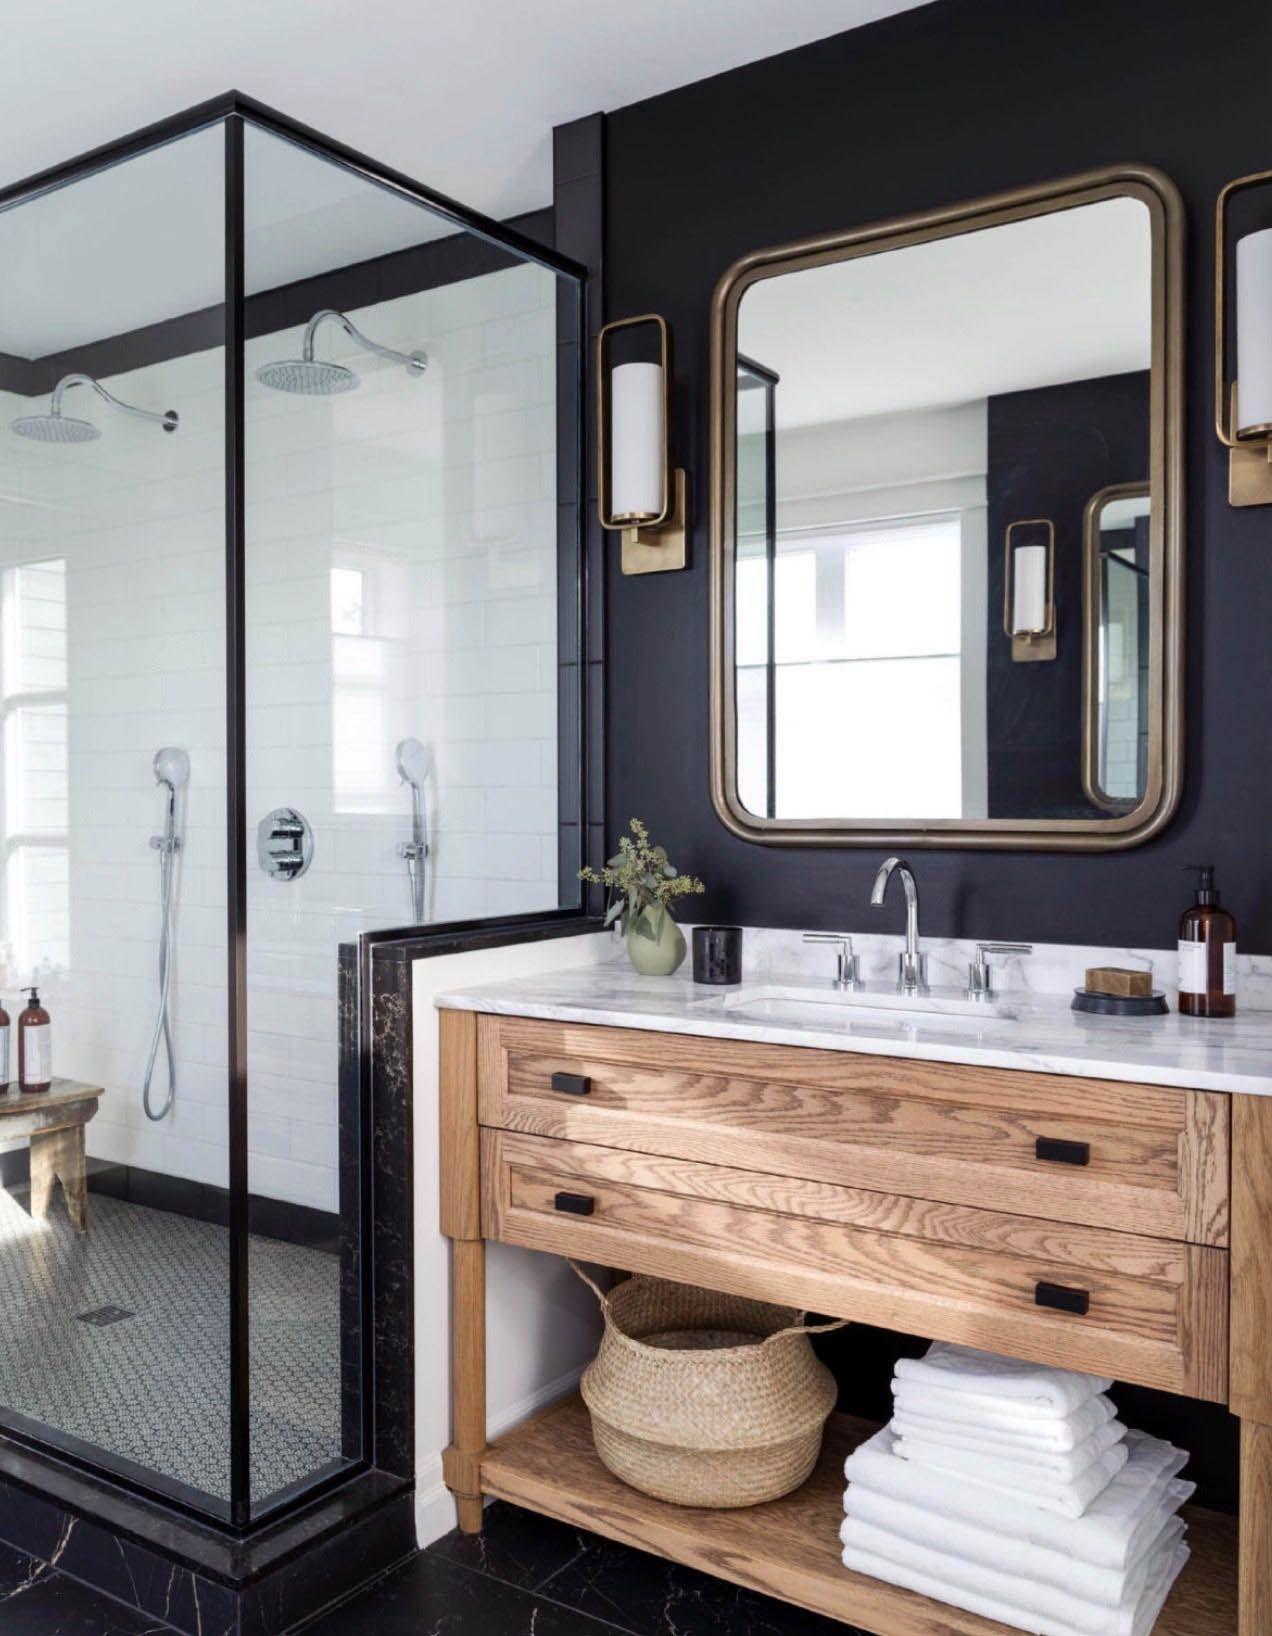 Ideal Bathroom Vanities Clearance You Ll Love Modern Bathroom Bathroom Interior Bathroom Design